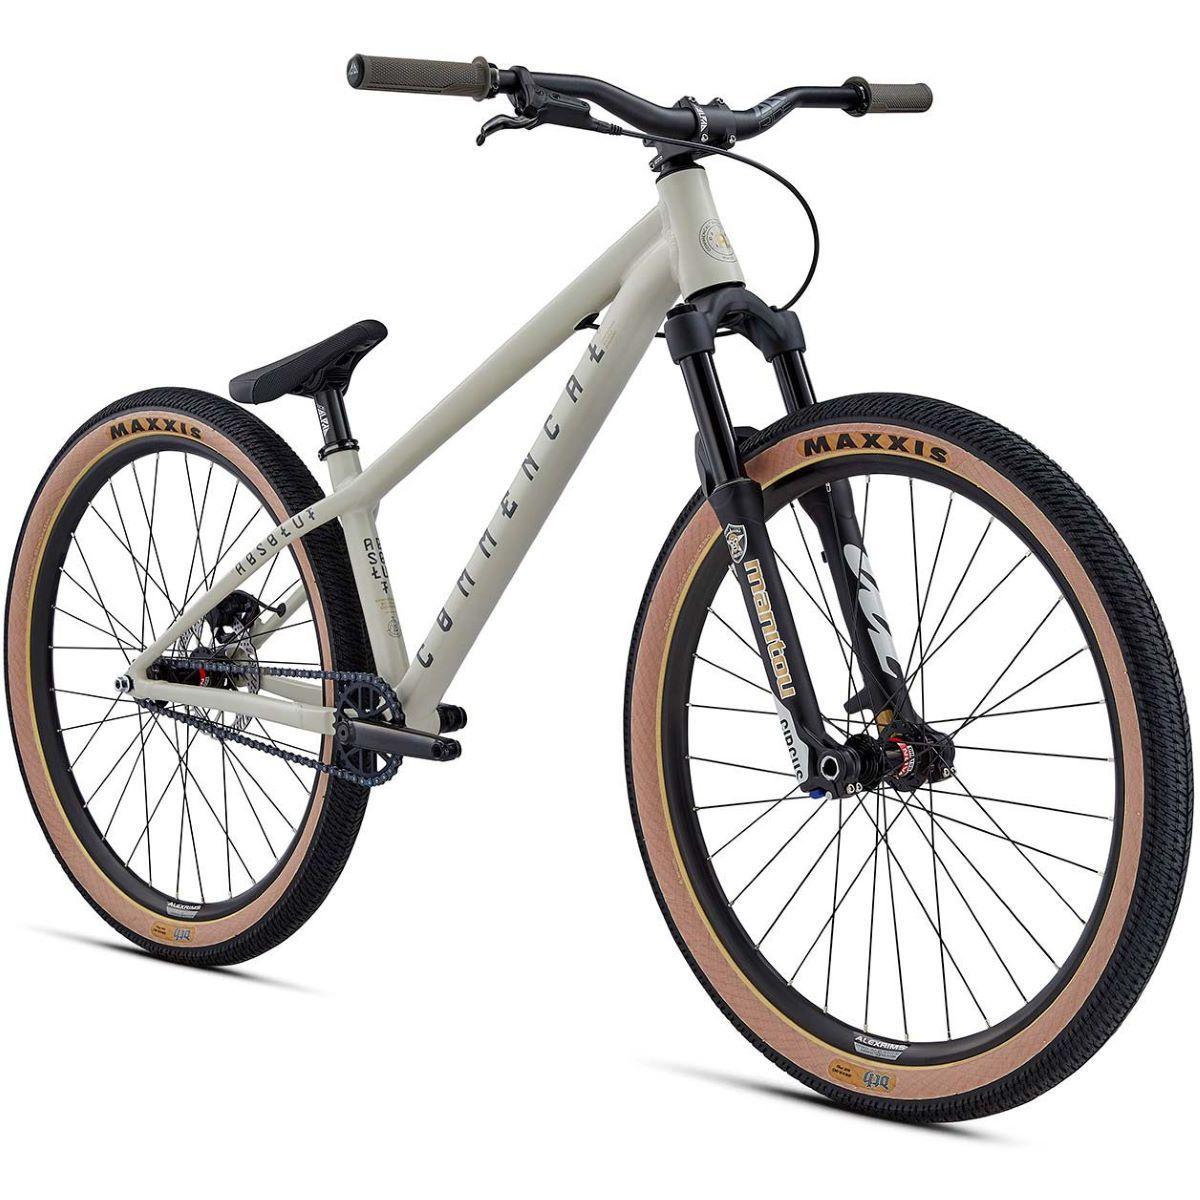 Wiggle Commencal Absolut Dirt Jump Bike 2020 Hard Tail Mountain Bikes Bike Freestyle Hardtail Mountain Bike Bike